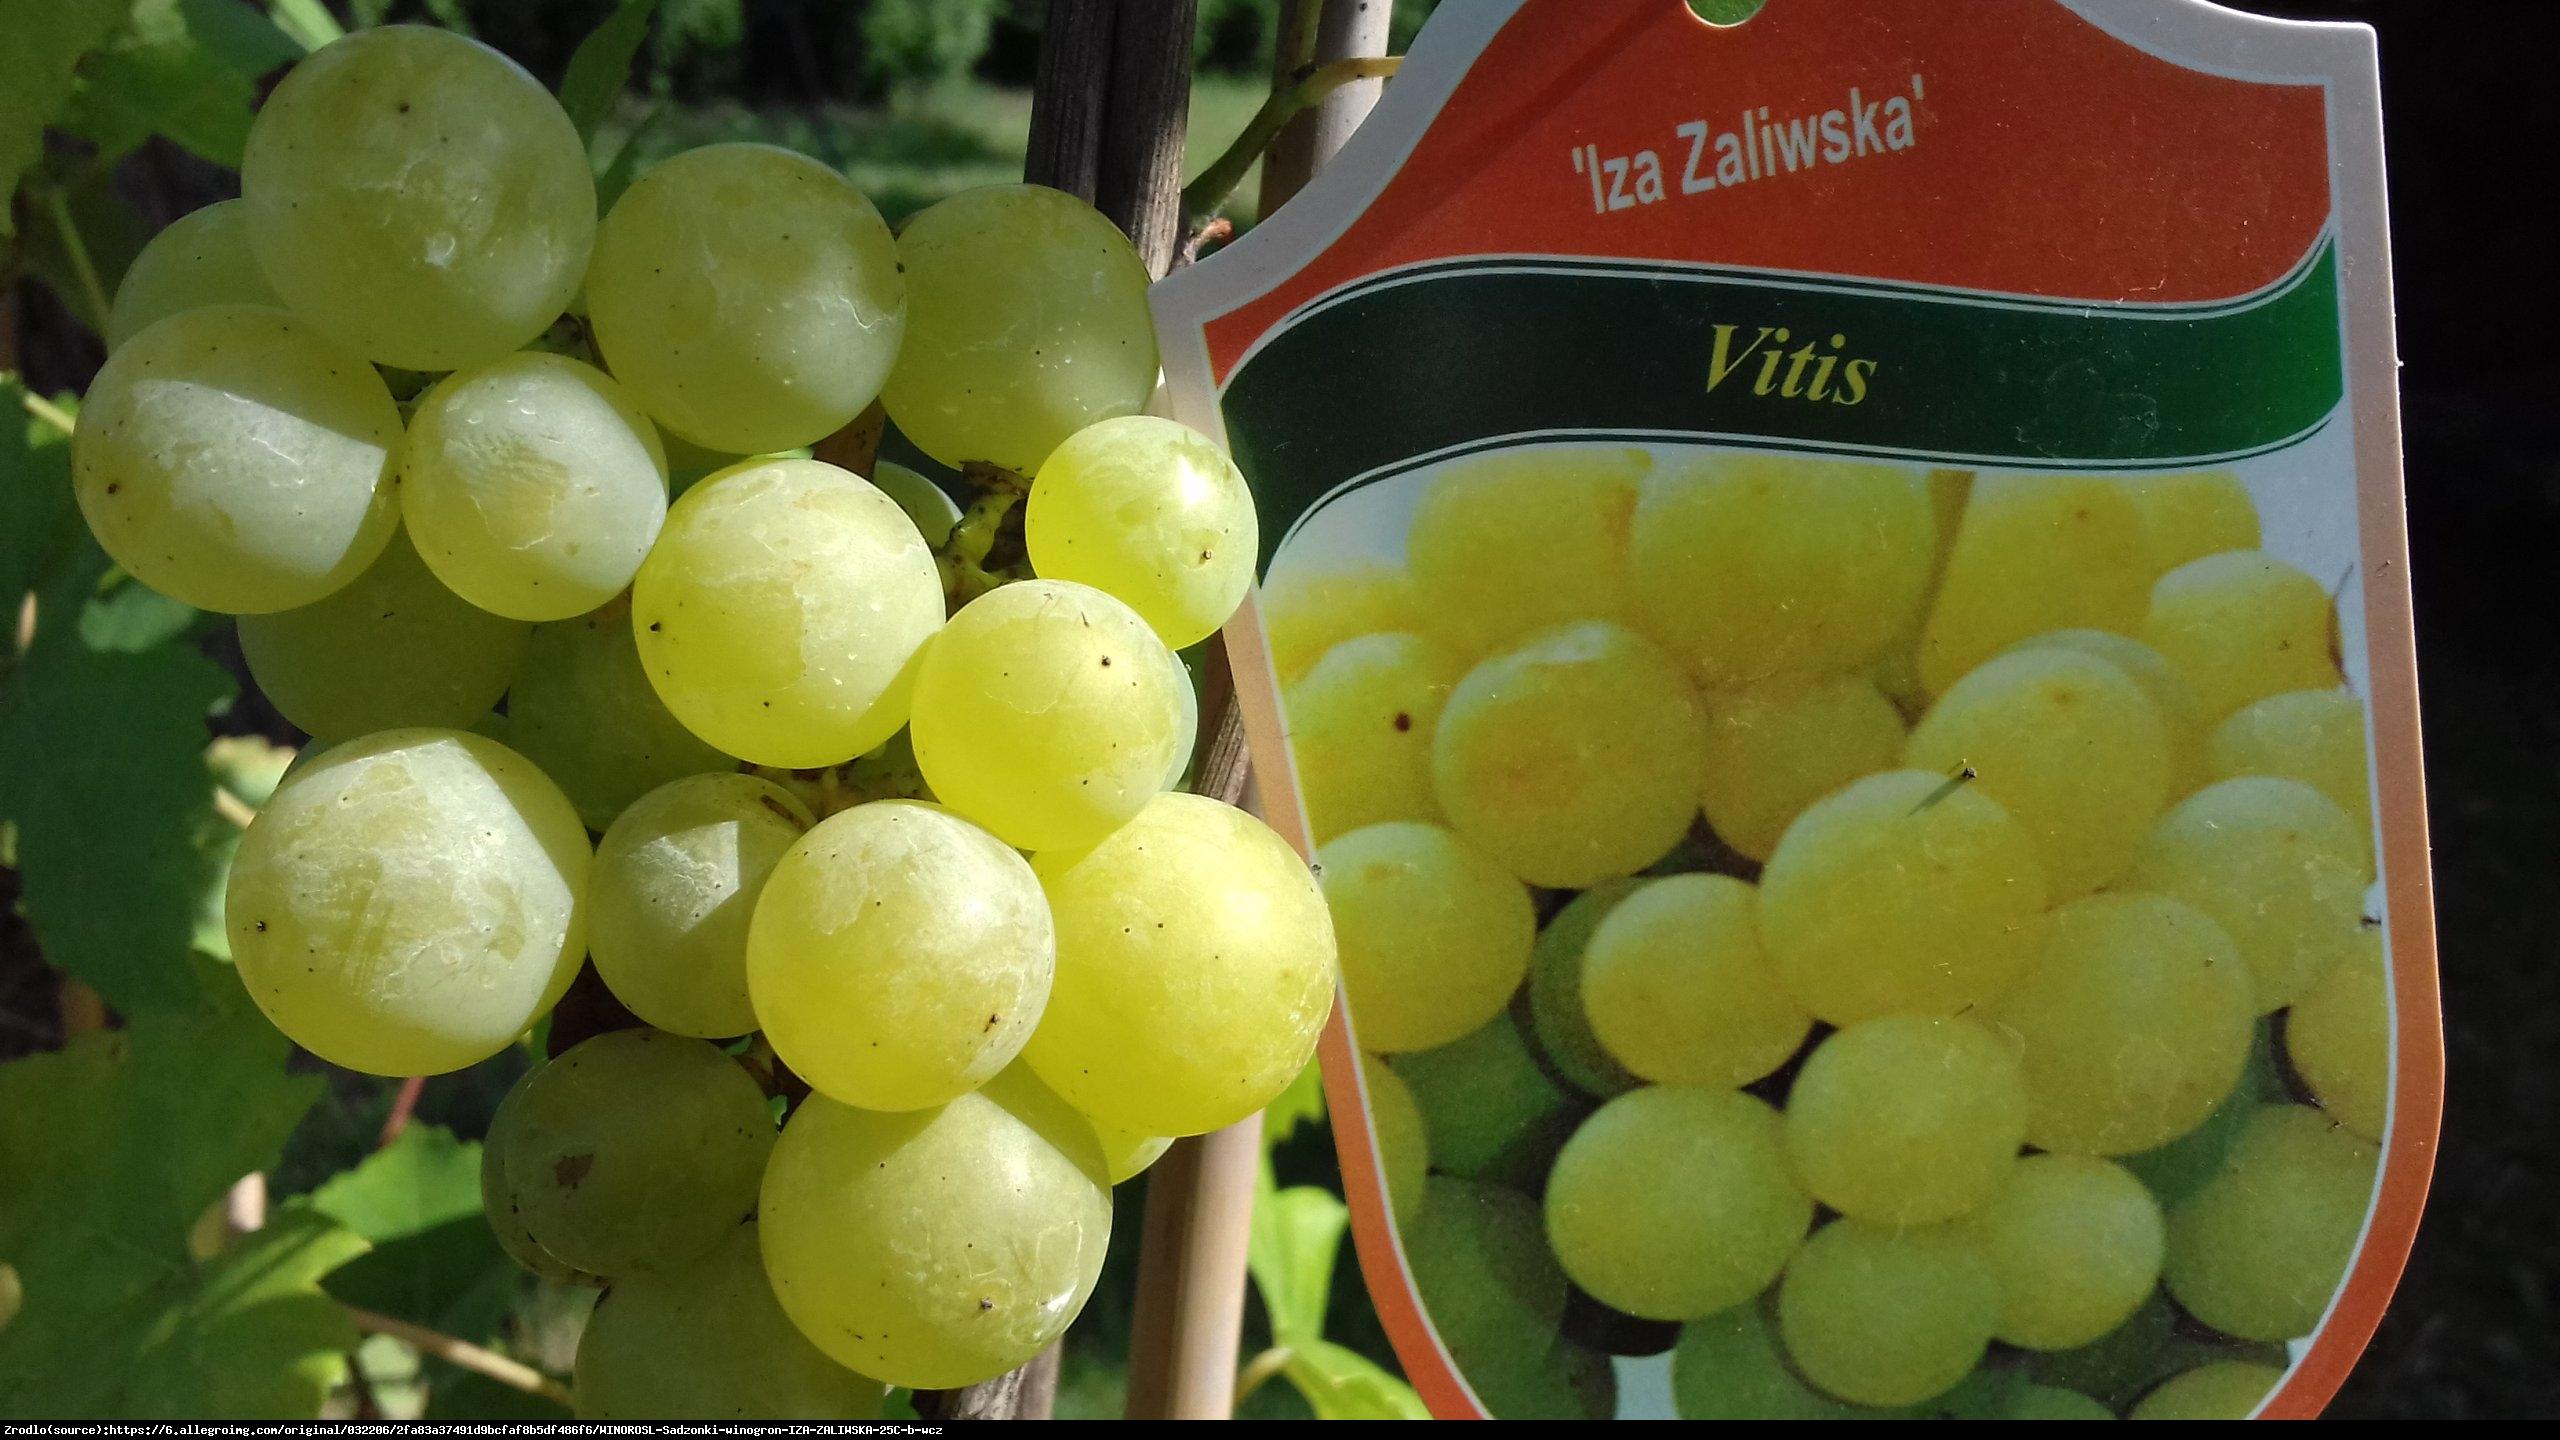 Winorośl Iza Zaliwska - Vitis